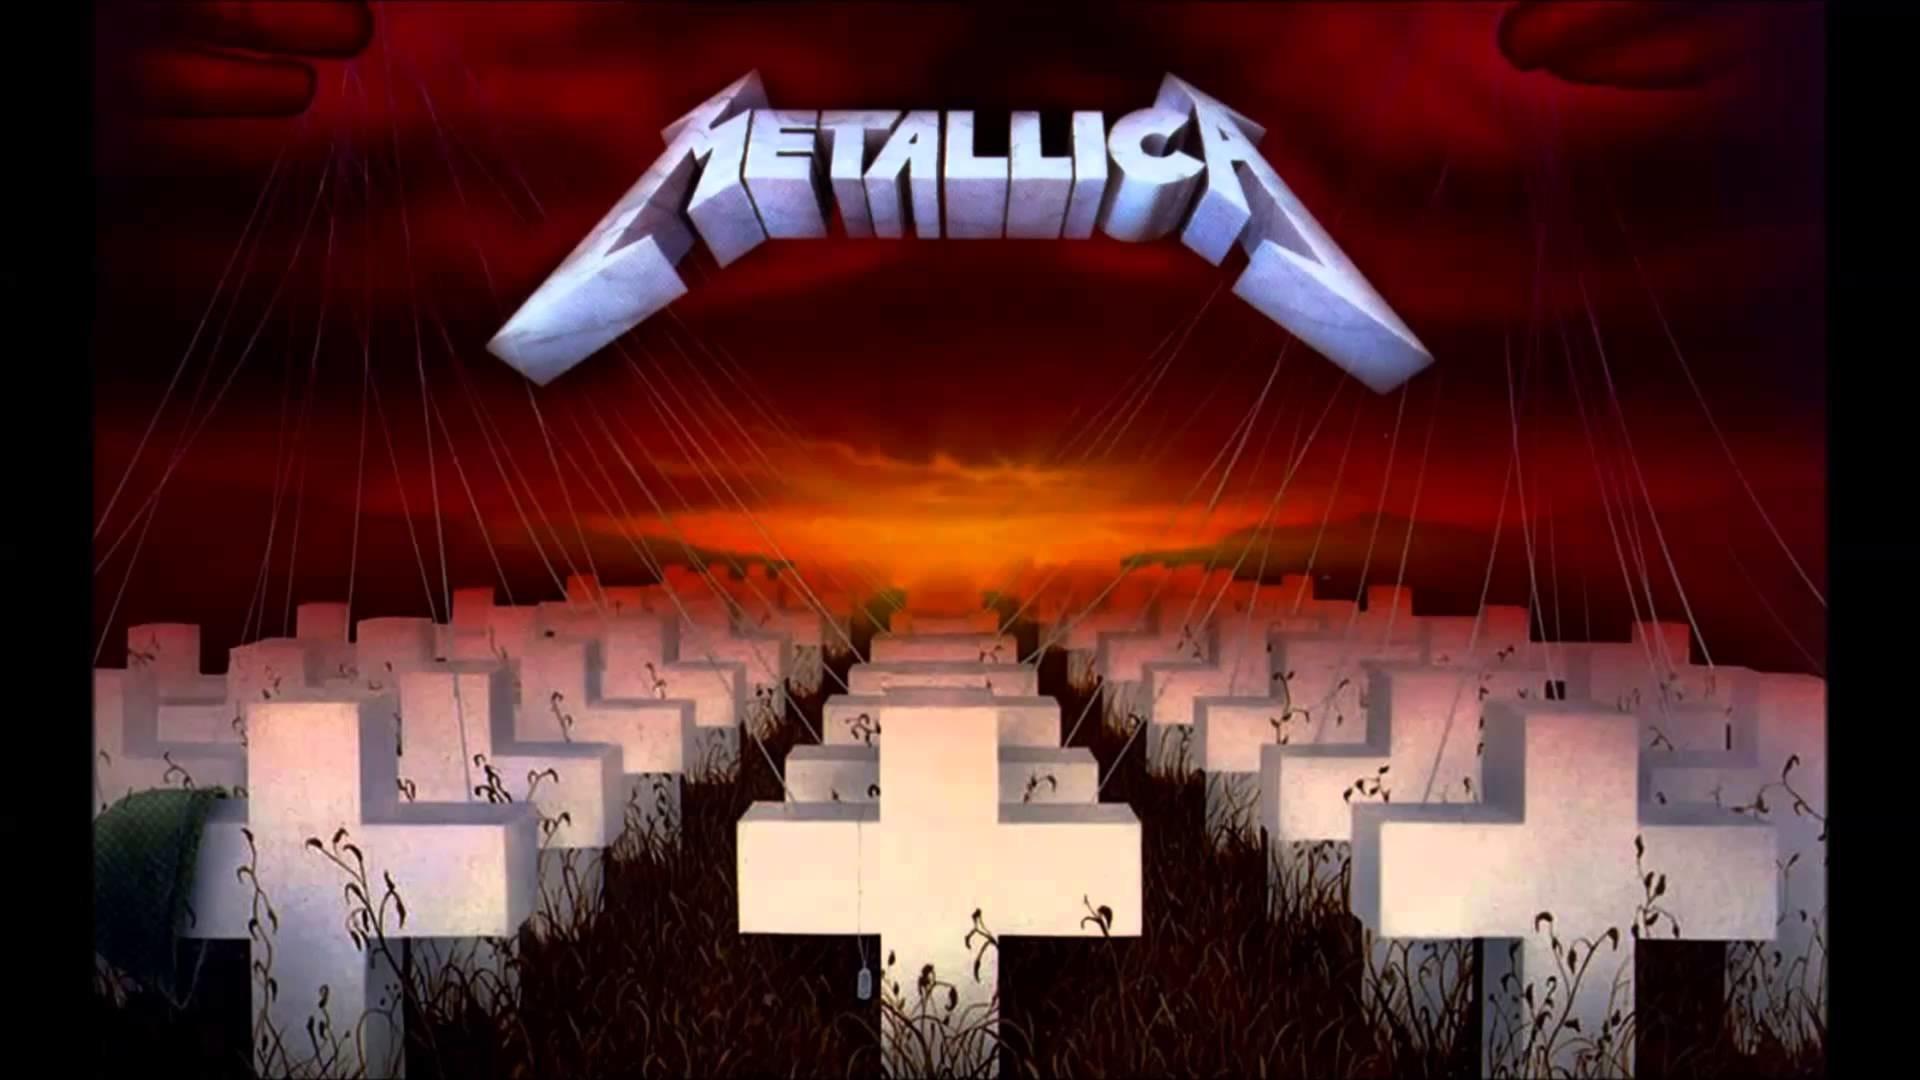 Metallica Master Of Puppets Wallpaper. All …